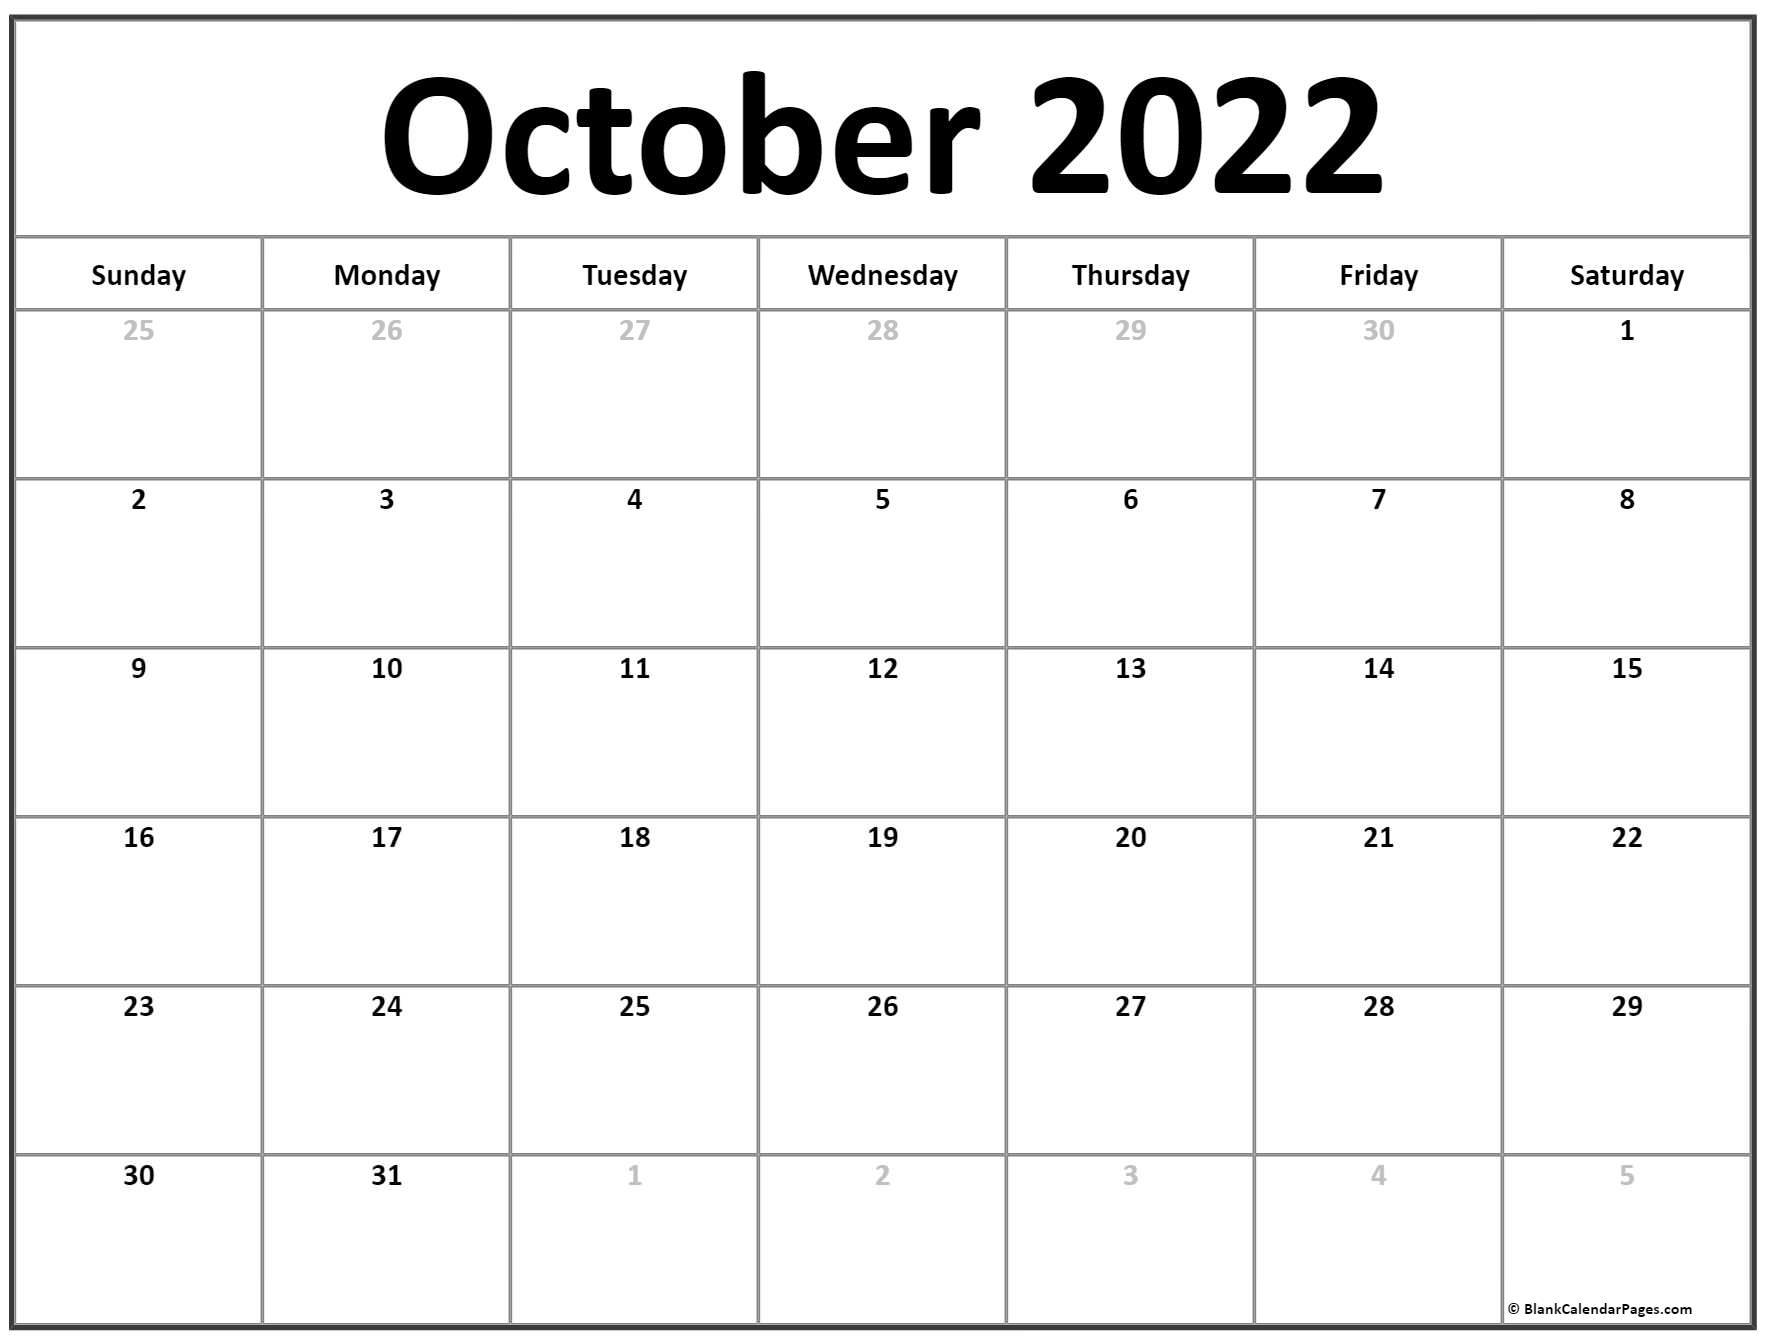 Keep a cat and pumpkin company on a magical night. October 2022 calendar | free printable calendar templates